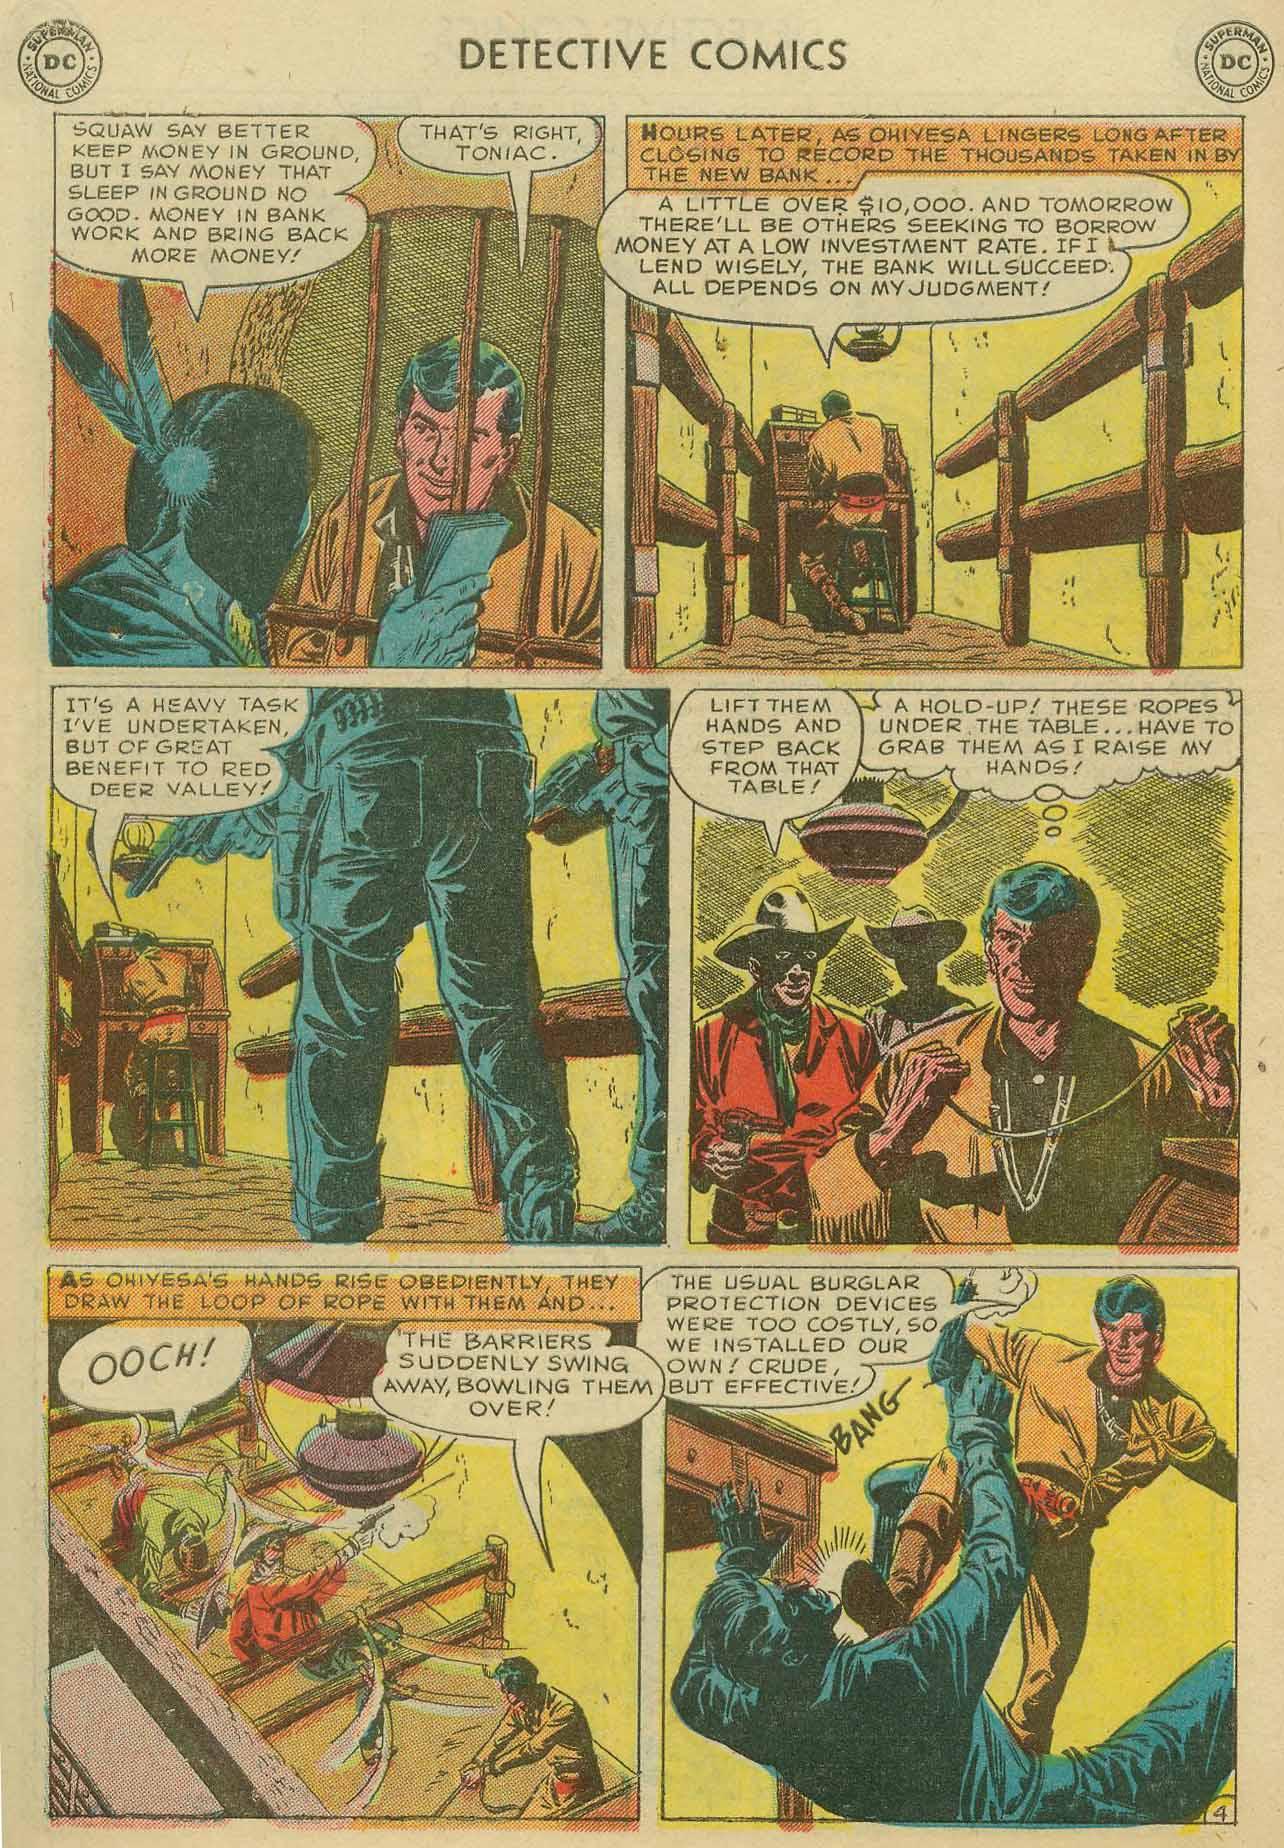 Detective Comics (1937) 175 Page 41